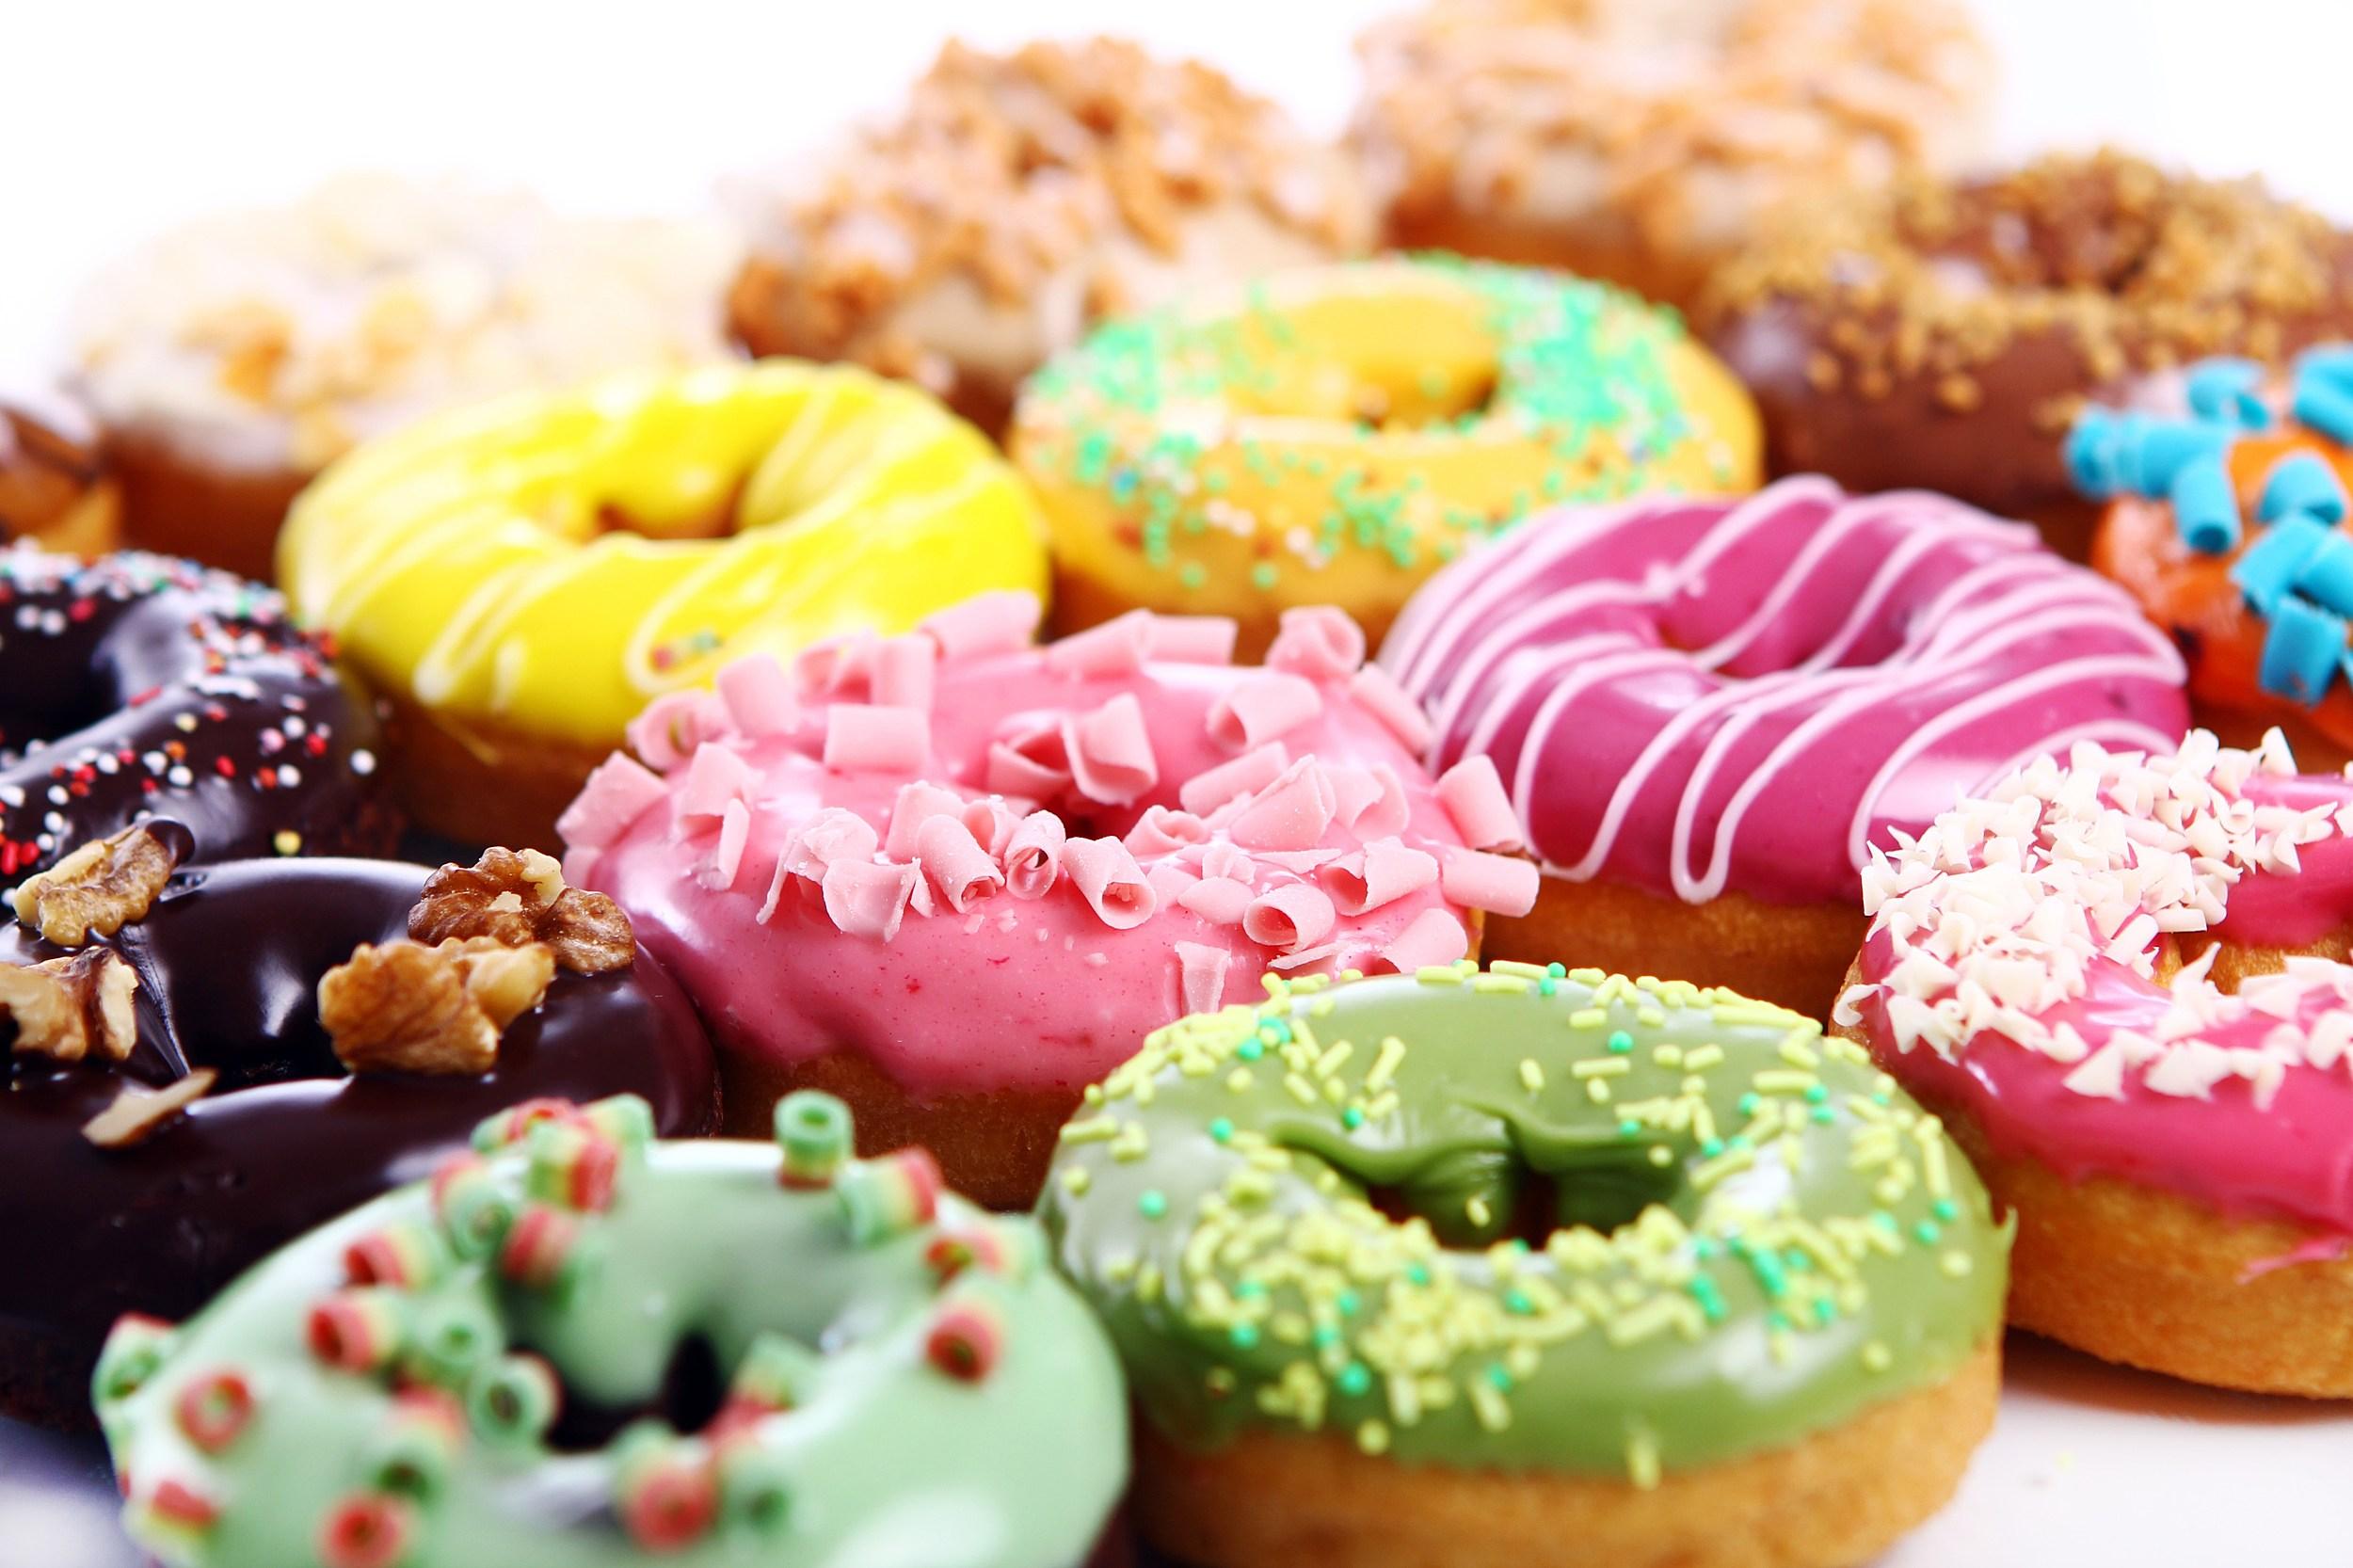 ec42db854dfe9 Popular Hudson Valley Donut Shop Announces Major Business Change